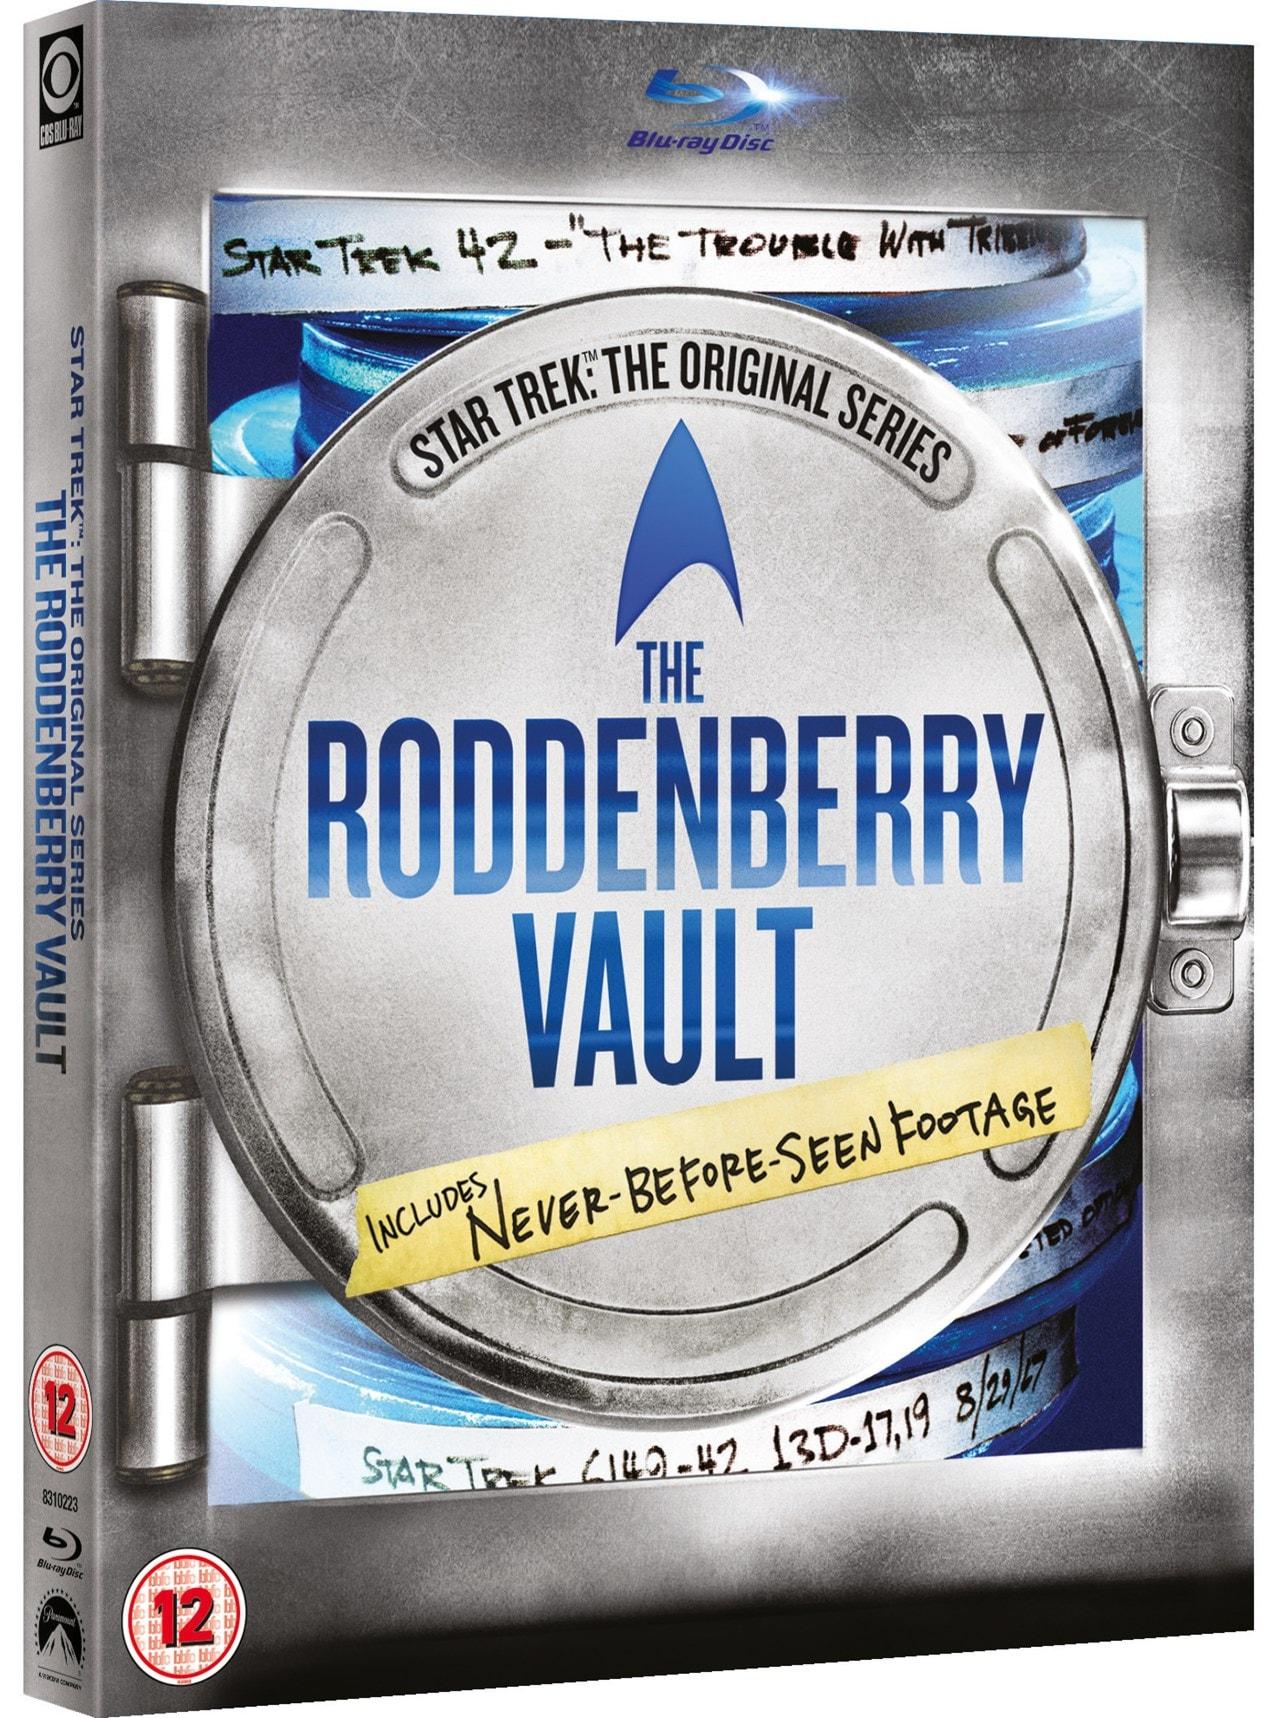 Star Trek: The Original Series - The Roddenberry Vault - 2